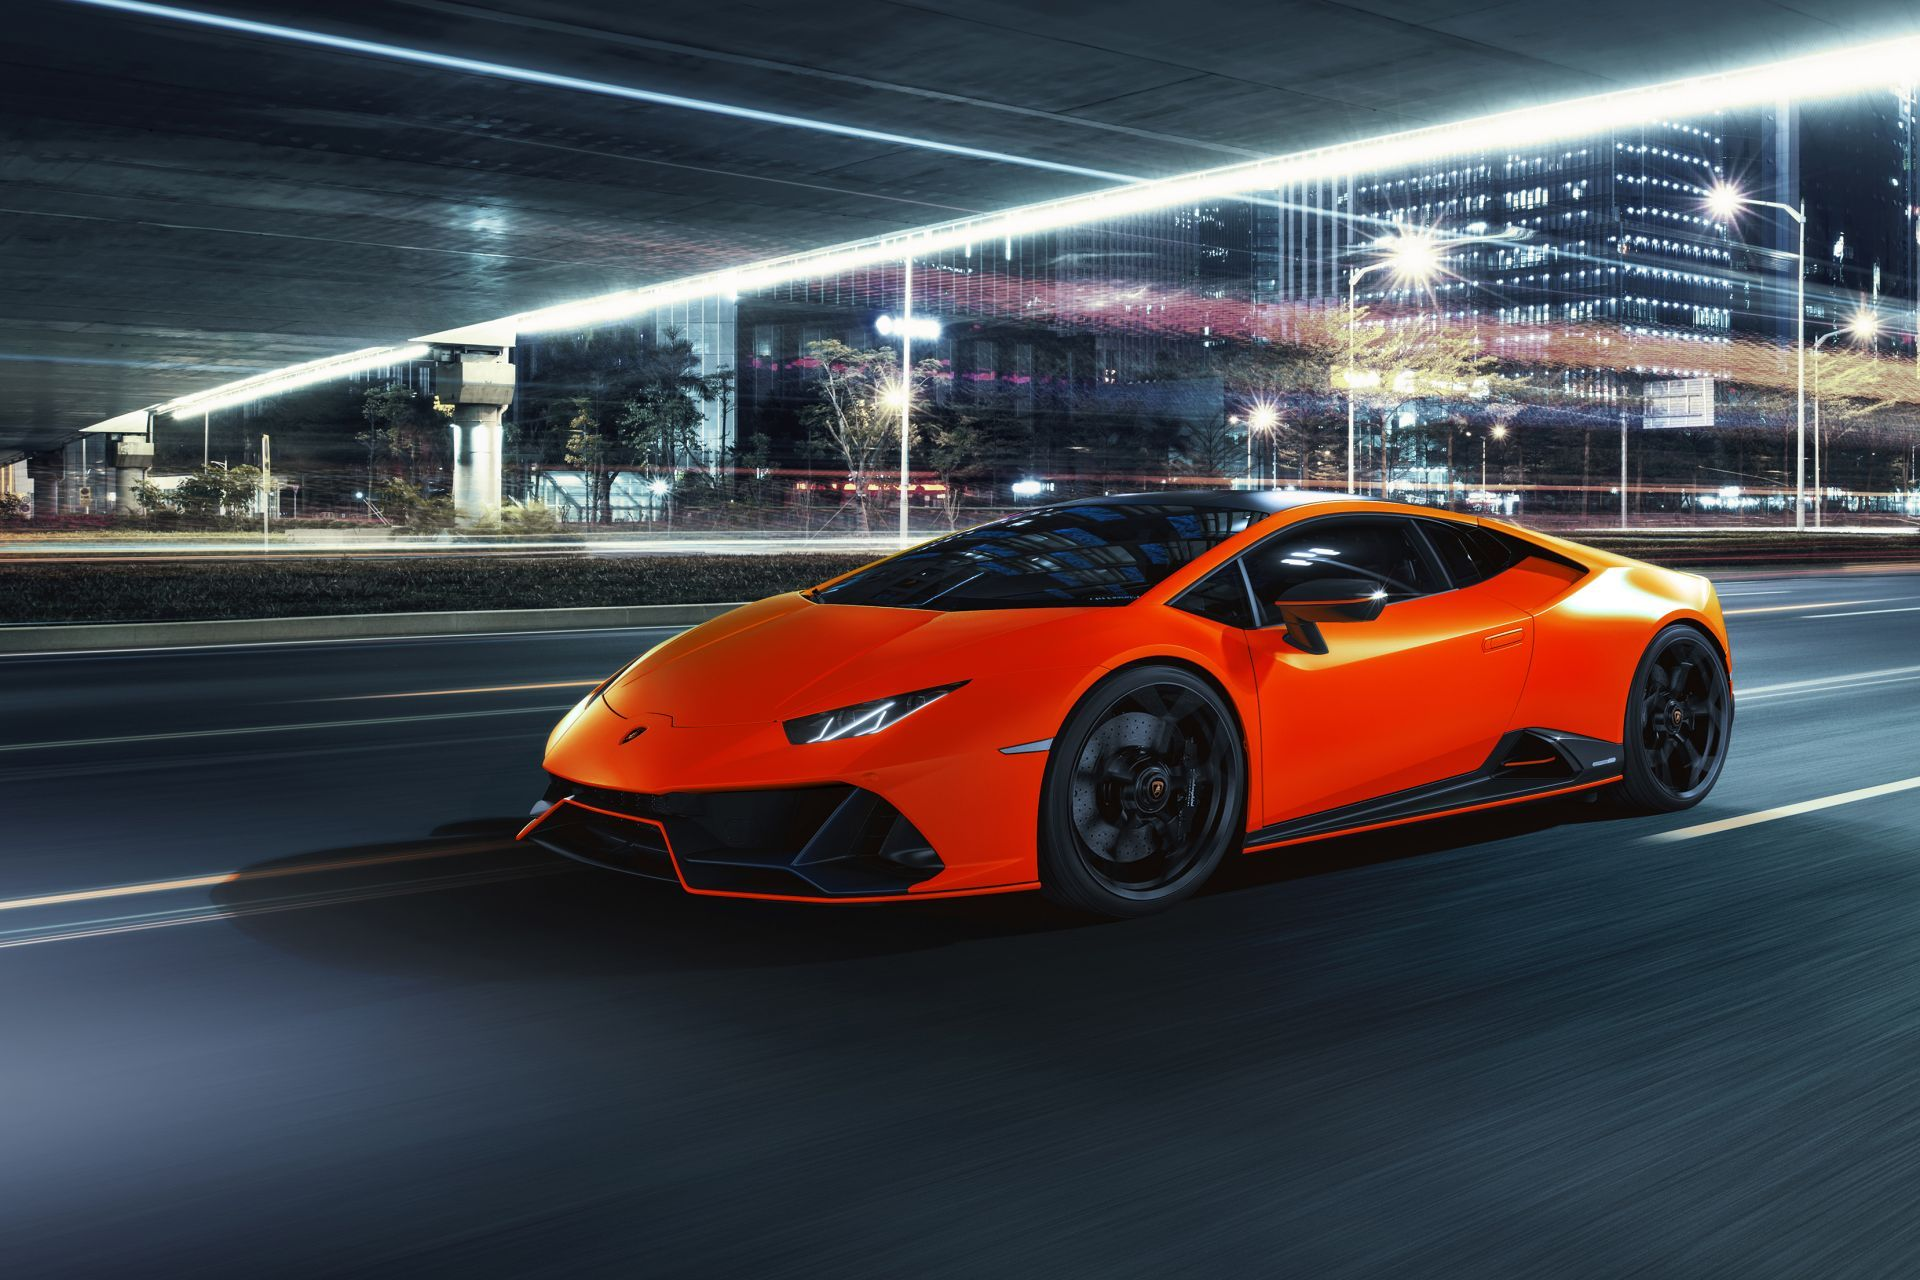 Lamborghini-Huracan-Evo-Fluo-Capsule-11